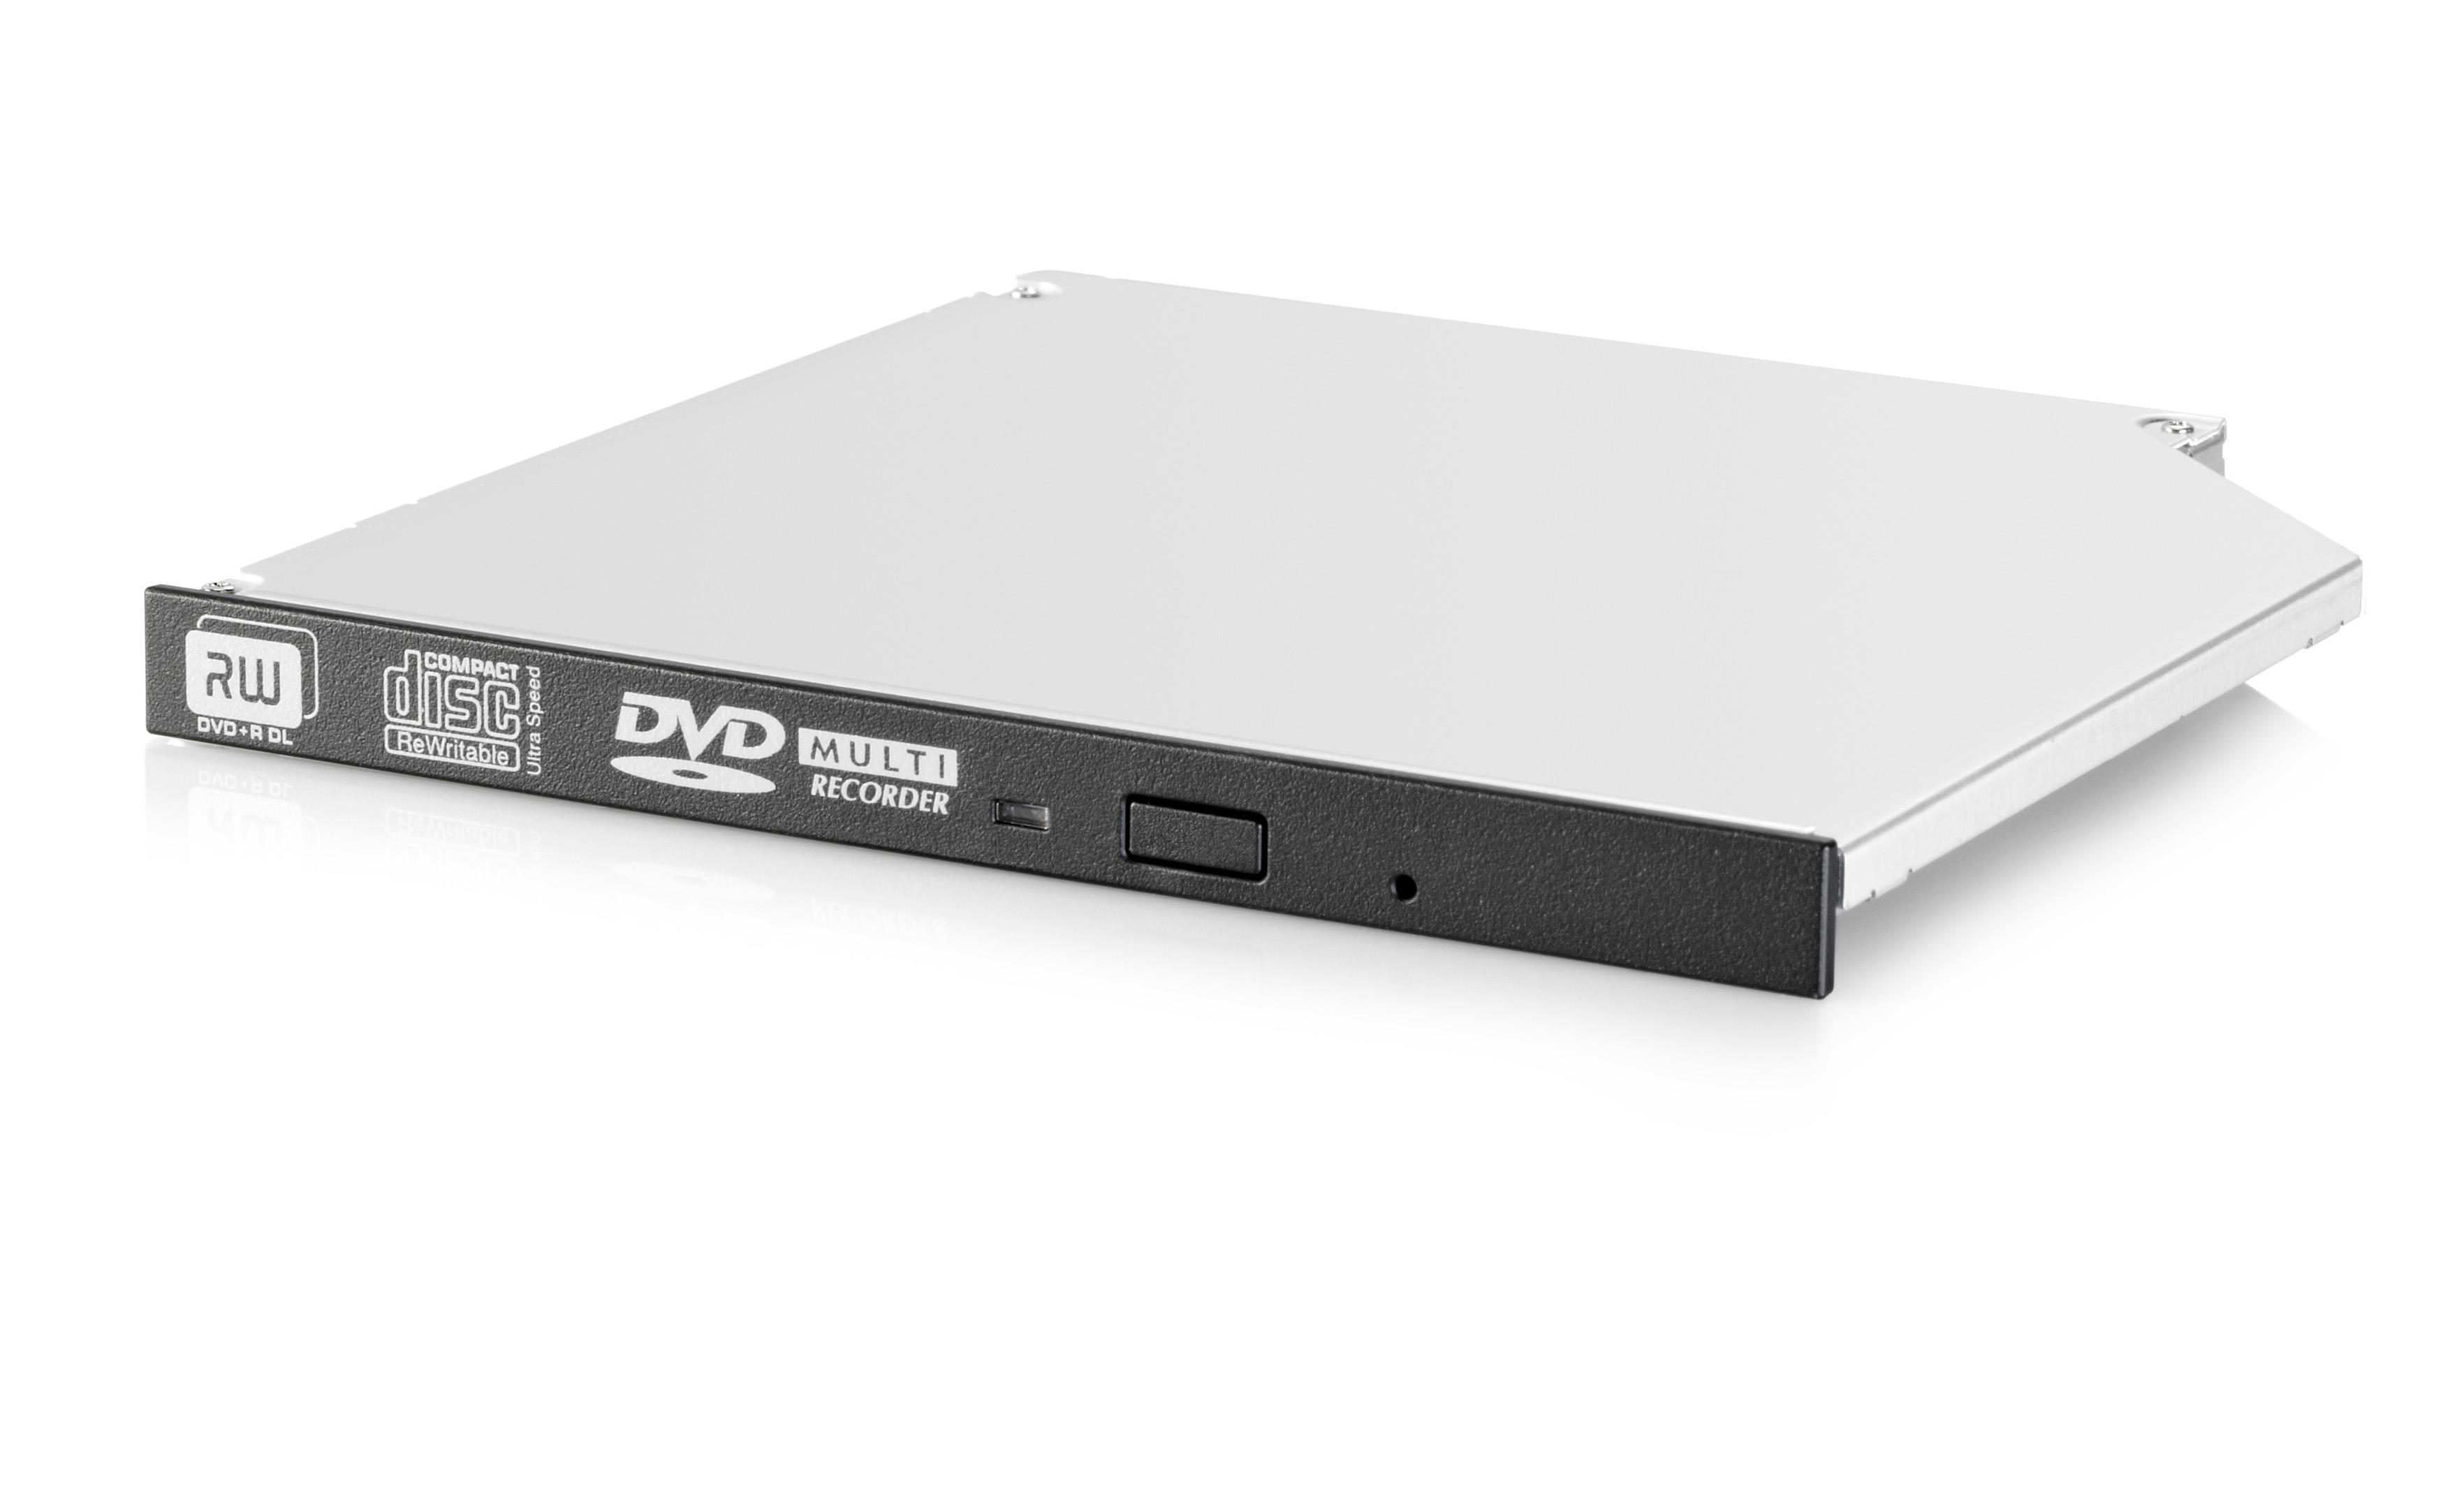 HP 9.5mm SATA DVD-RW Optical Drive (Internal) JackBlack for ProLiant Gen9 Servers